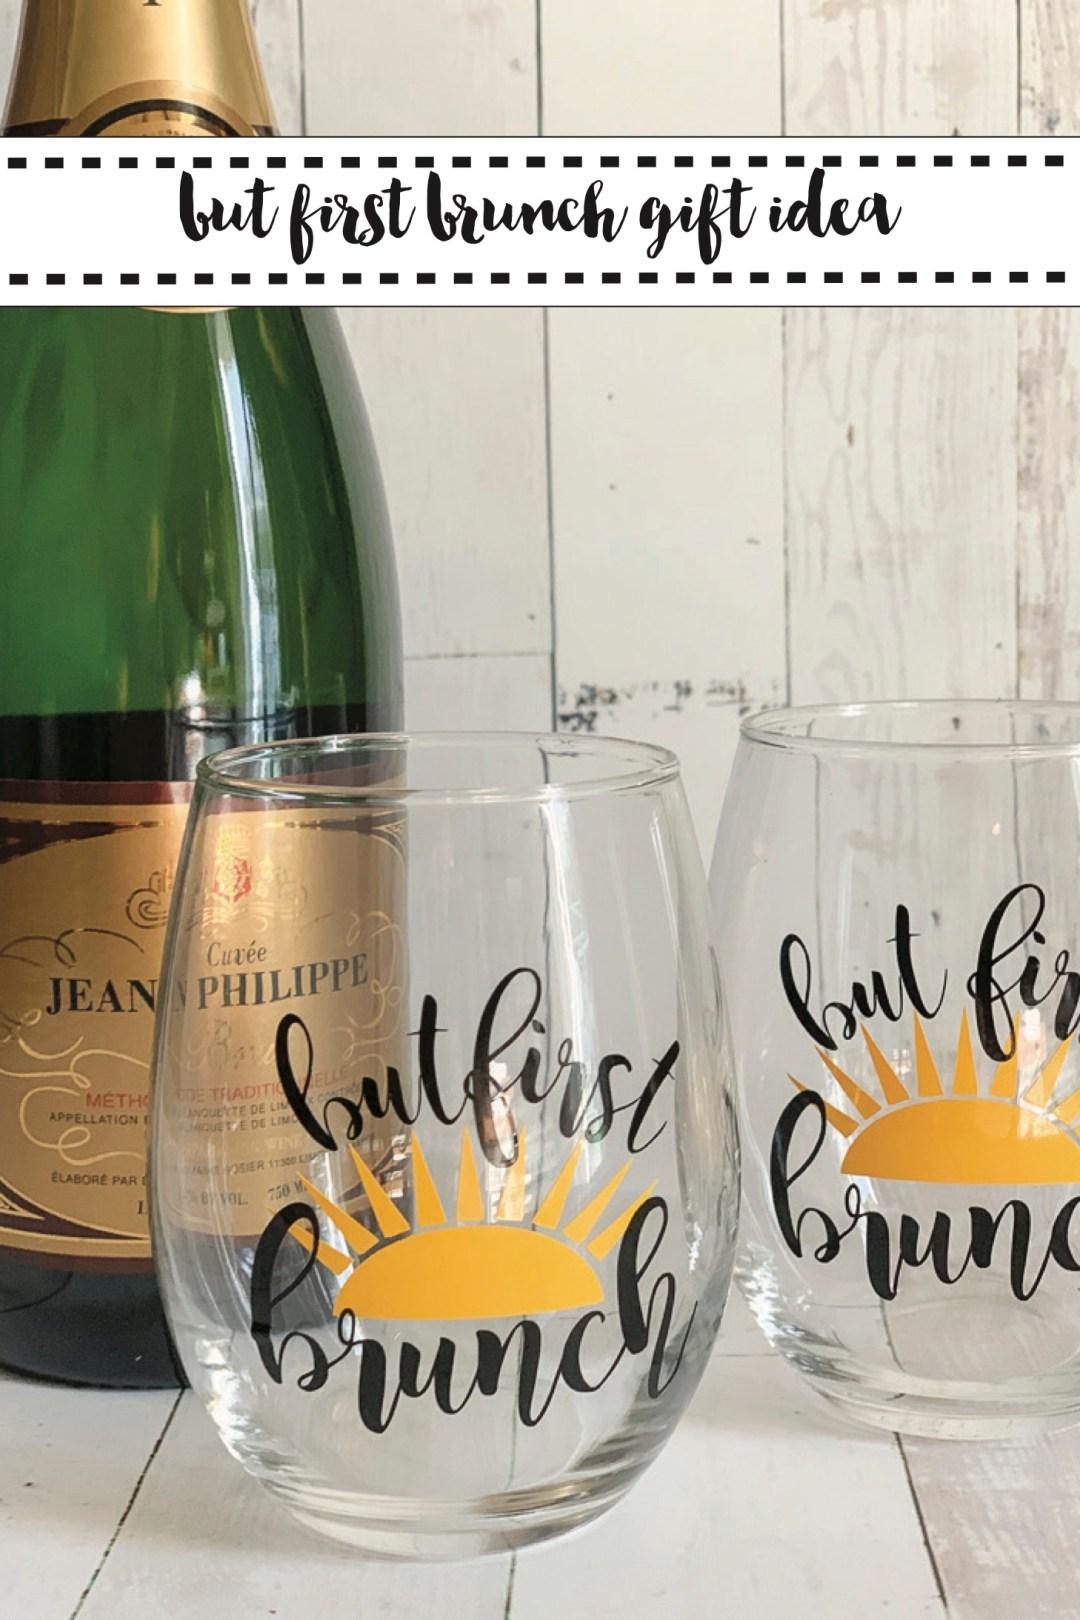 Sparkling Wine Stemless Funny Wine Glasses